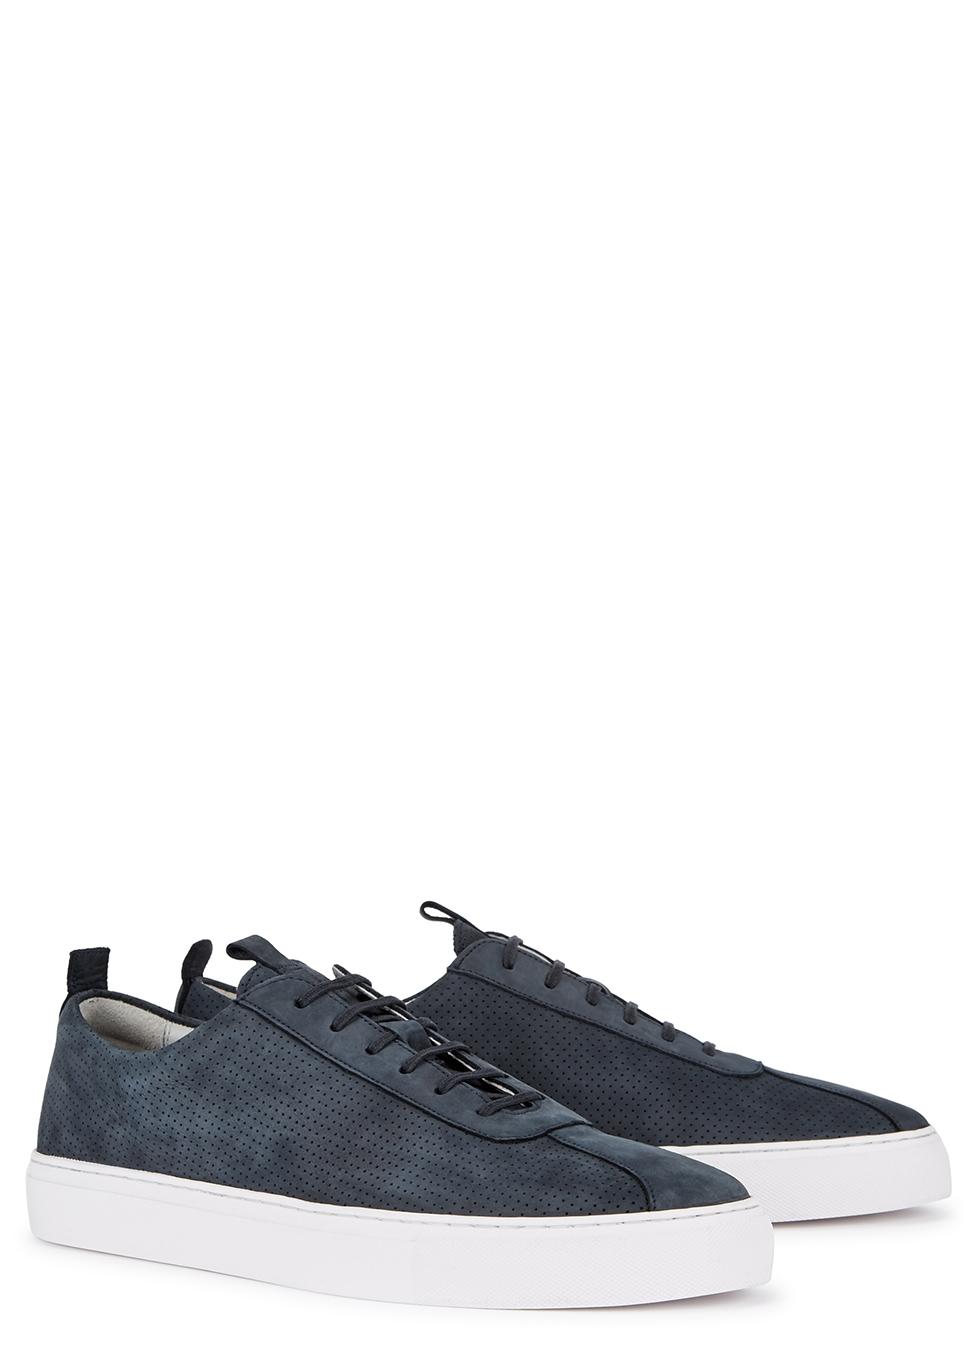 9cf756ad0d24 Men s Designer Shoes - Men s Footwear - Harvey Nichols